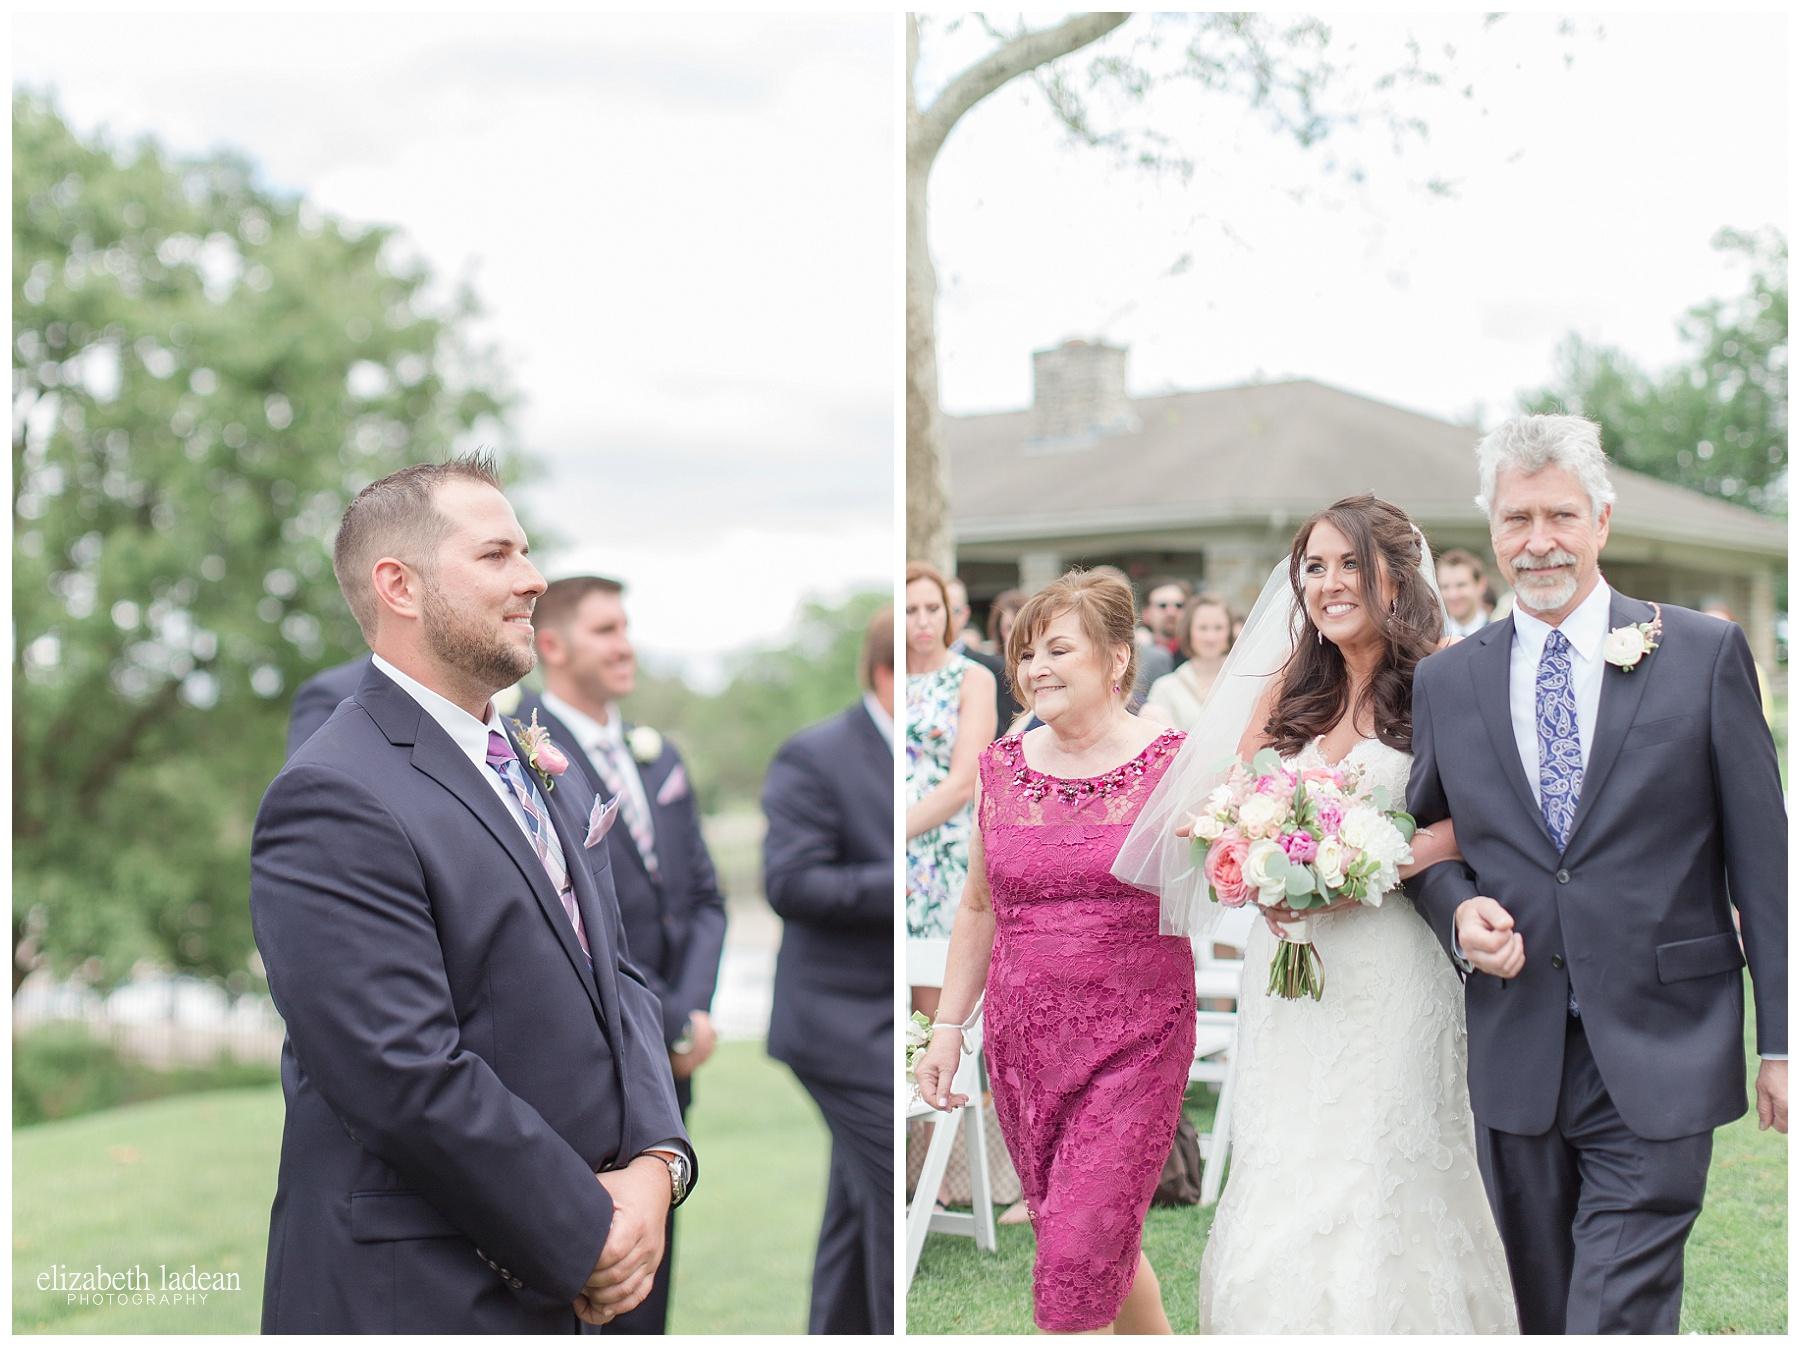 Hillcrest-Country-Club-Kansas-City-Wedding-Photography-E+J-0520-Elizabeth-Ladean-Photography-photo_0836.jpg